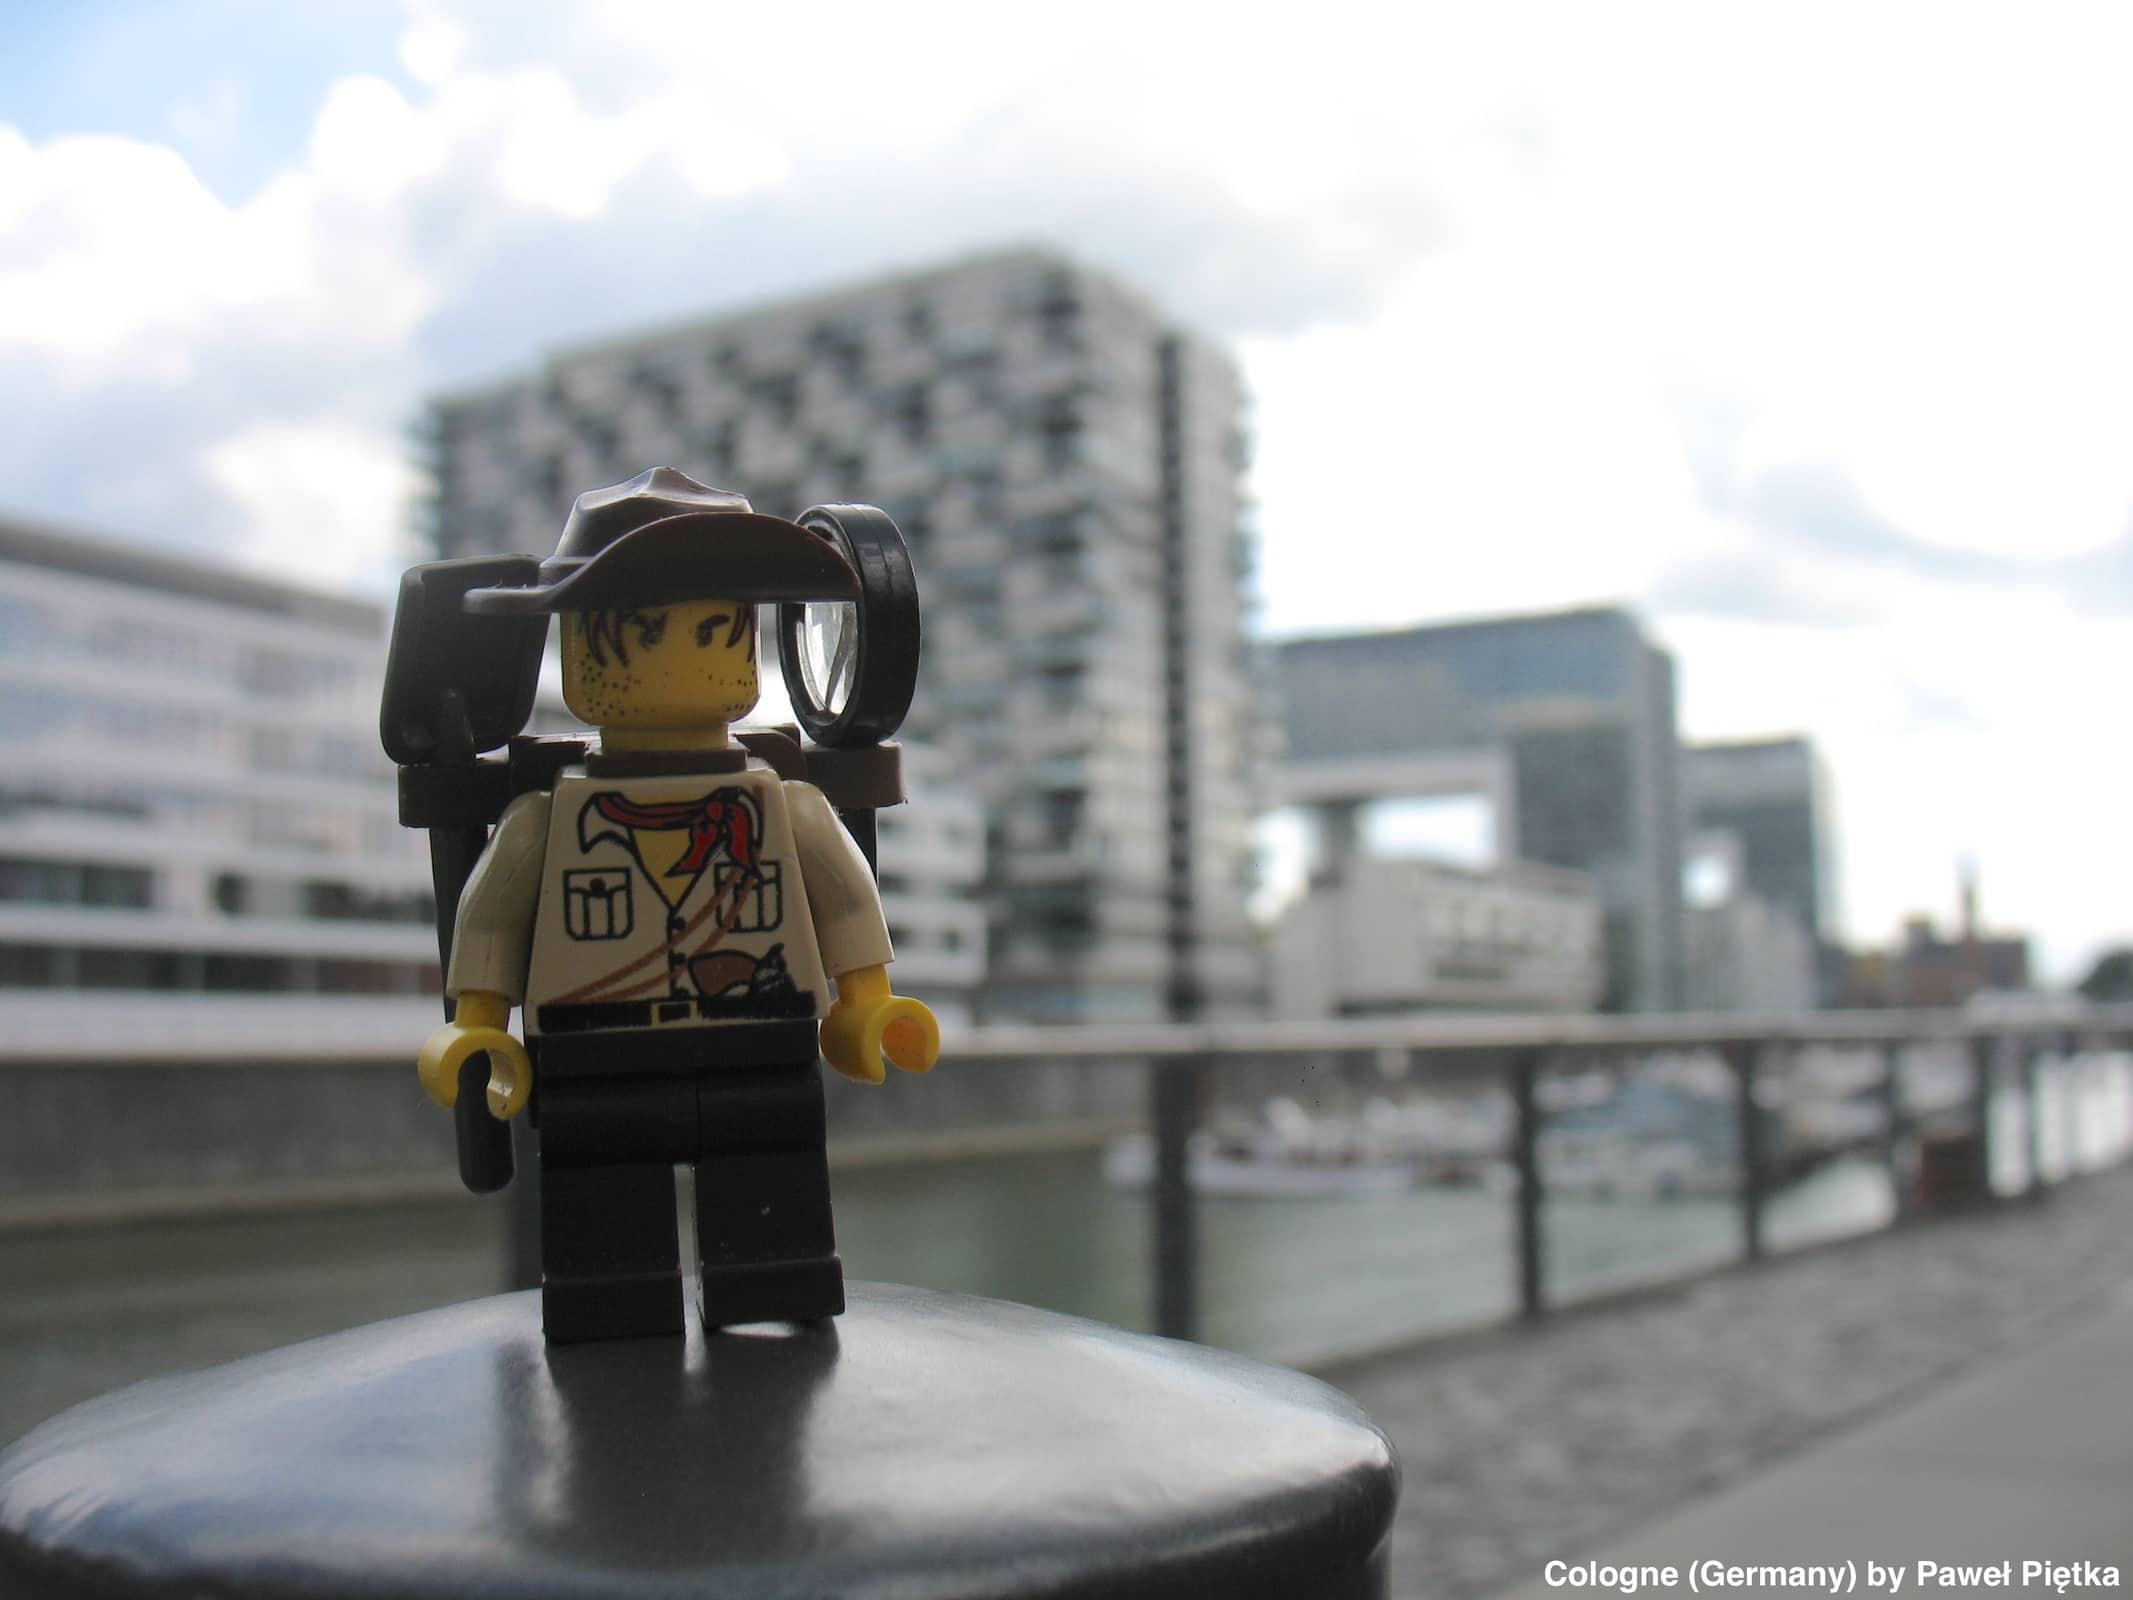 Cologne (Germany) - Rheinau harbour